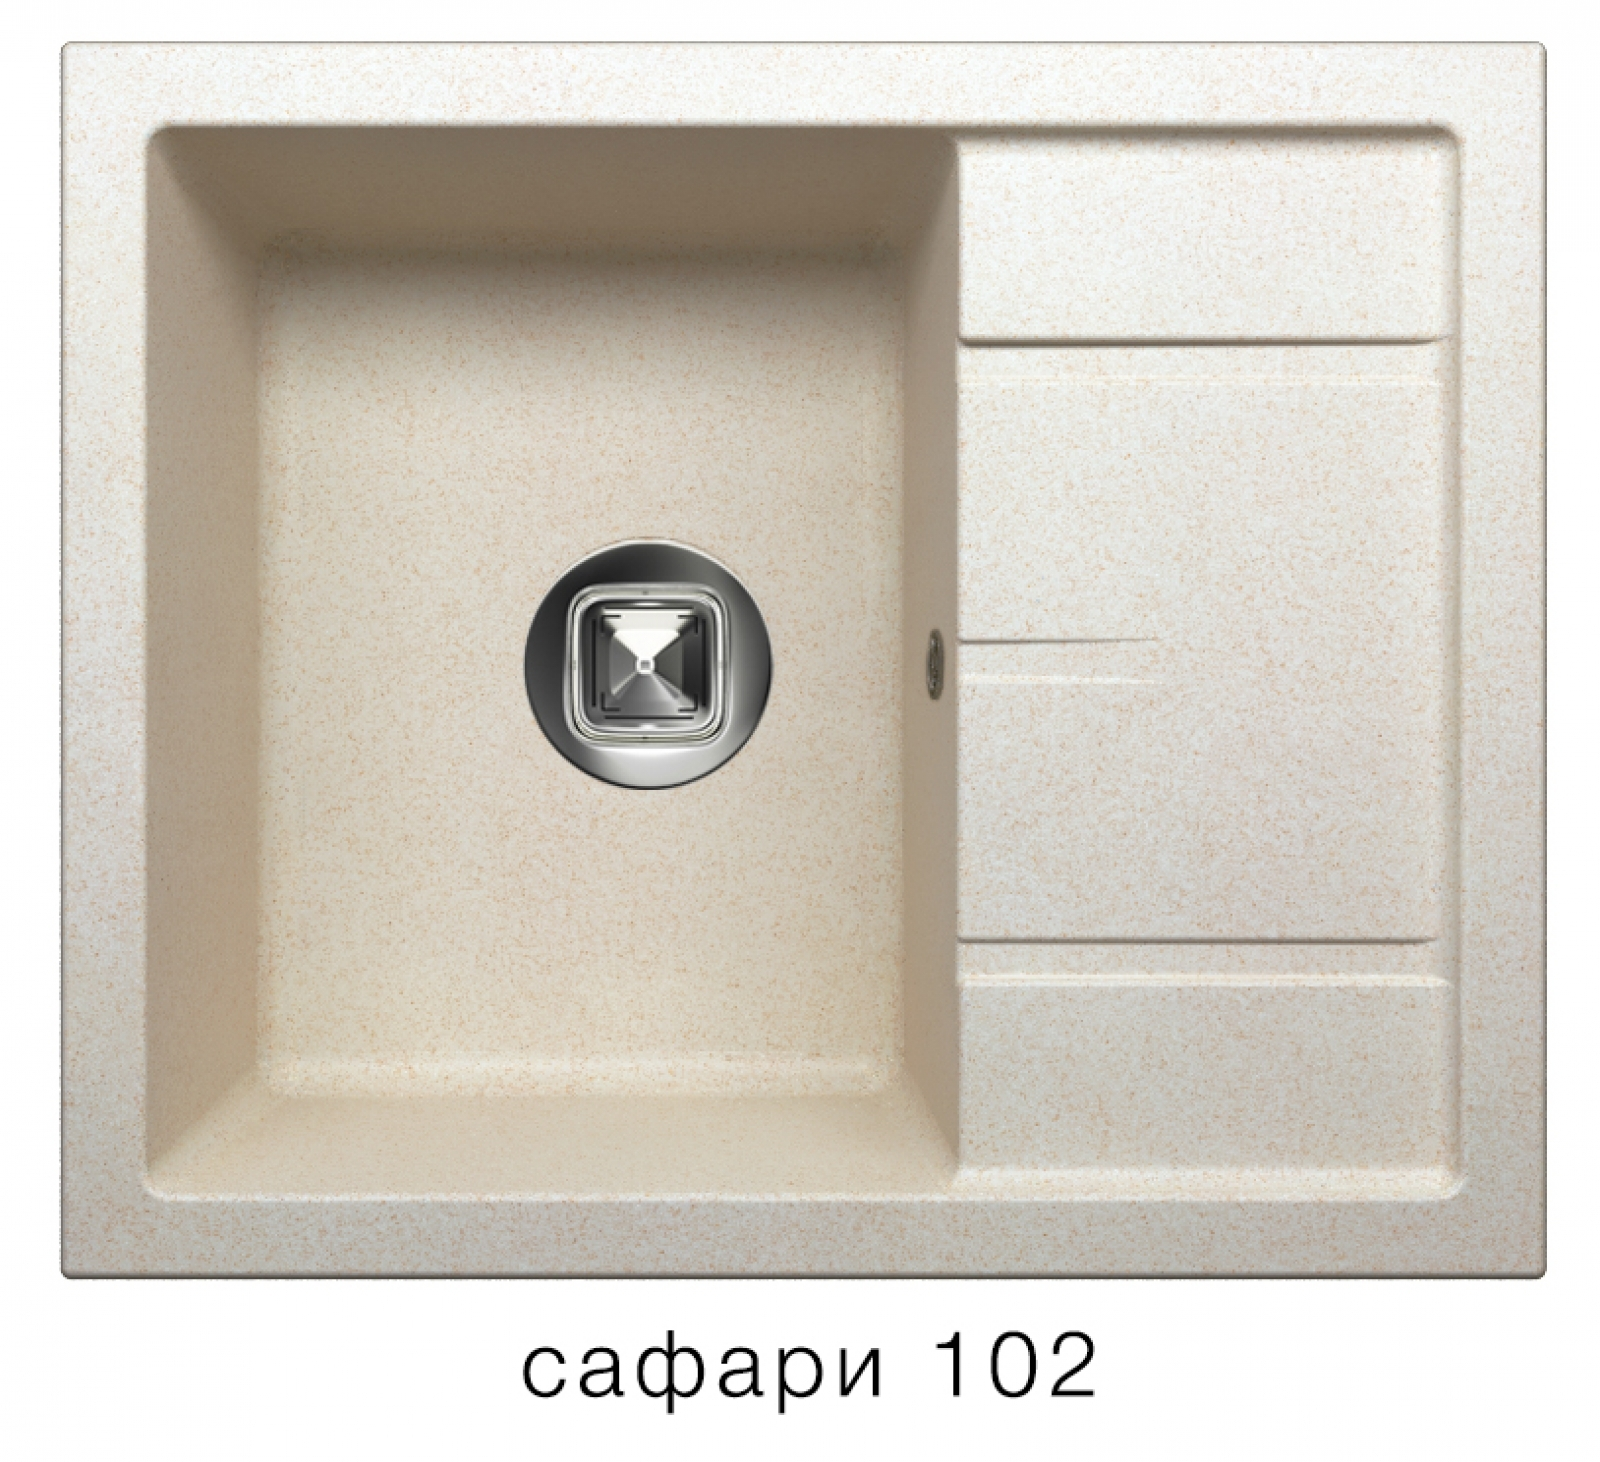 Мойка Tolero-R-107-102, цвет - Сафари